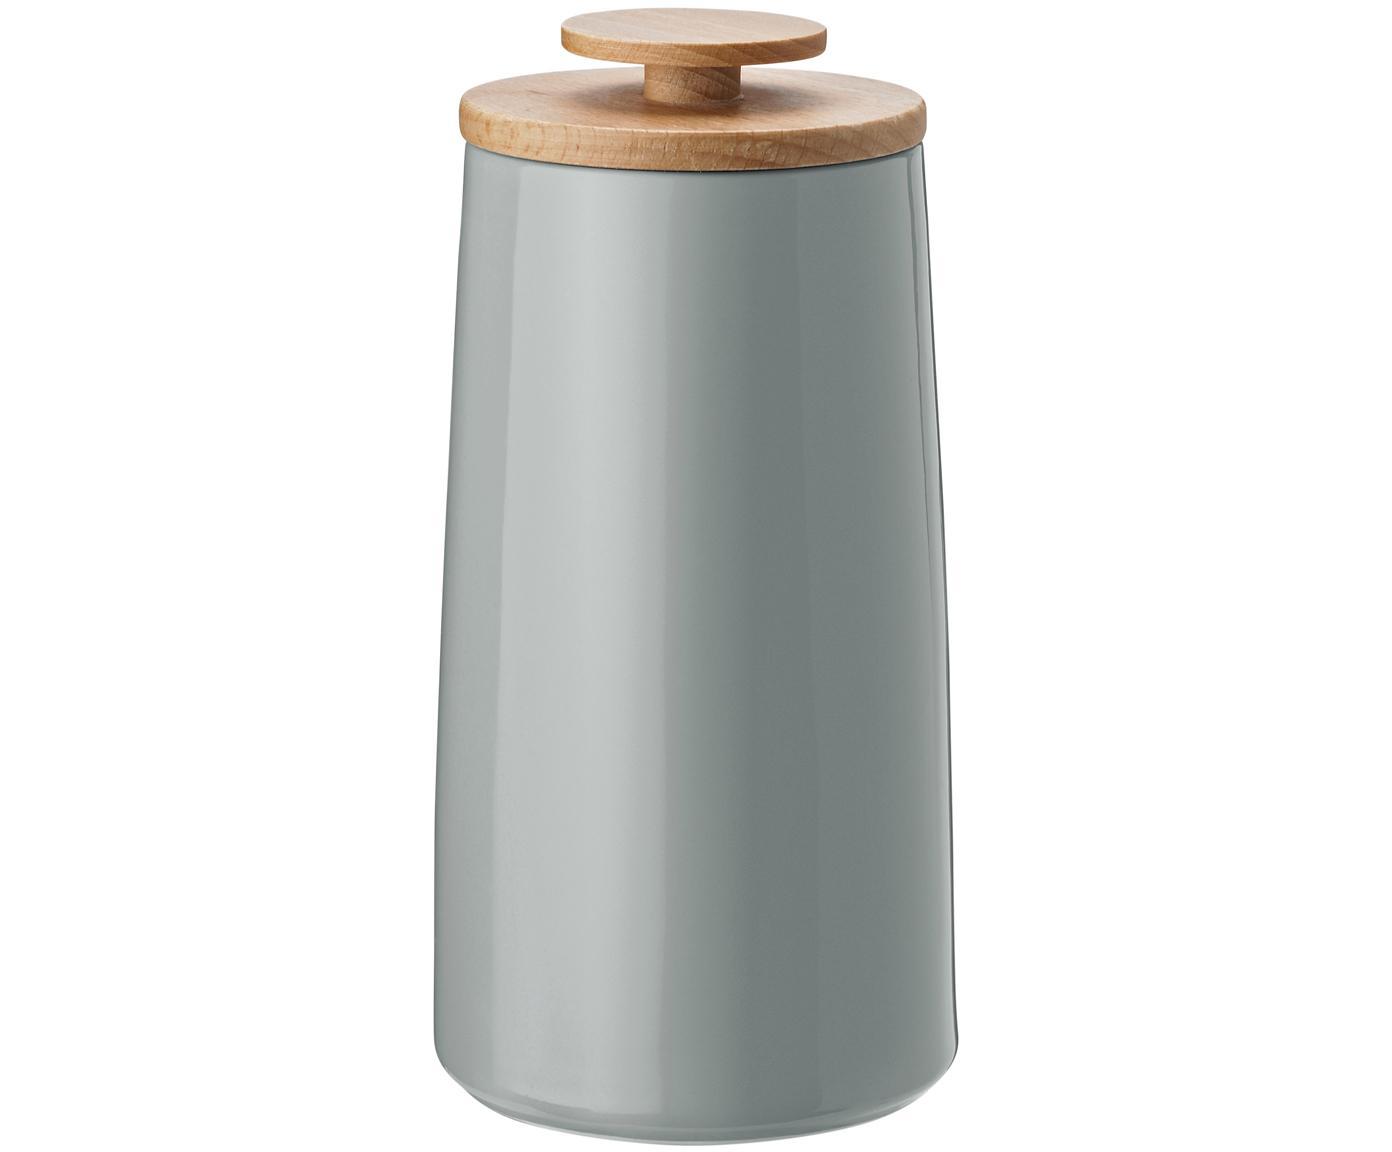 Opbergpot Emma, Deksel: beukenhout, Opbergpot: grijs. Deksel: beukenhoutkleurig, Inhoud: 300 g